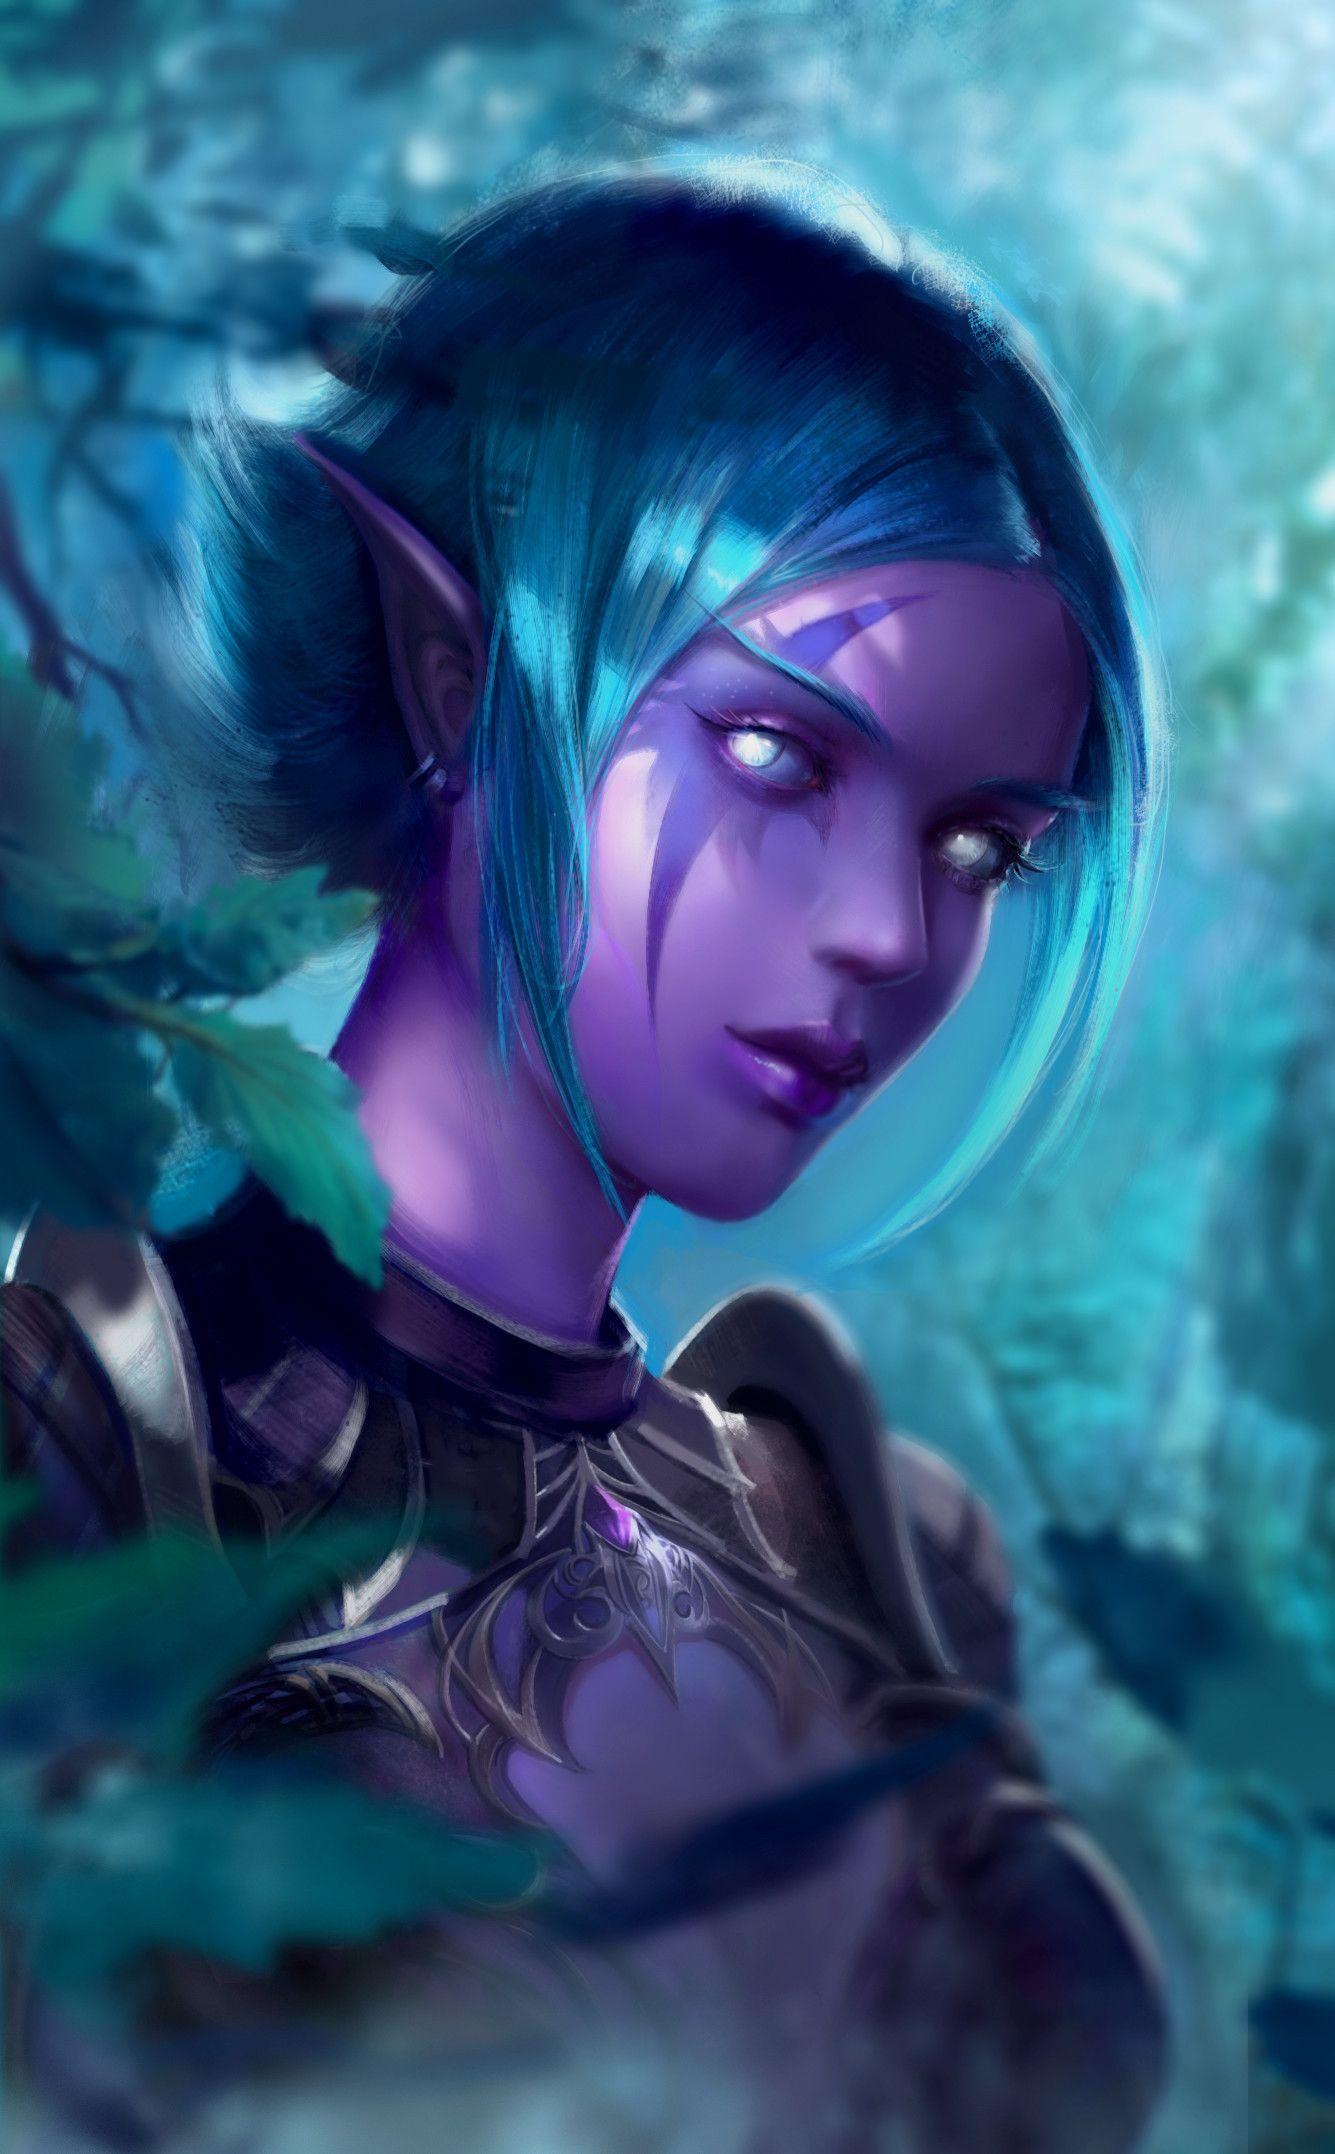 elf female world of warcraft night elves art | Night elf